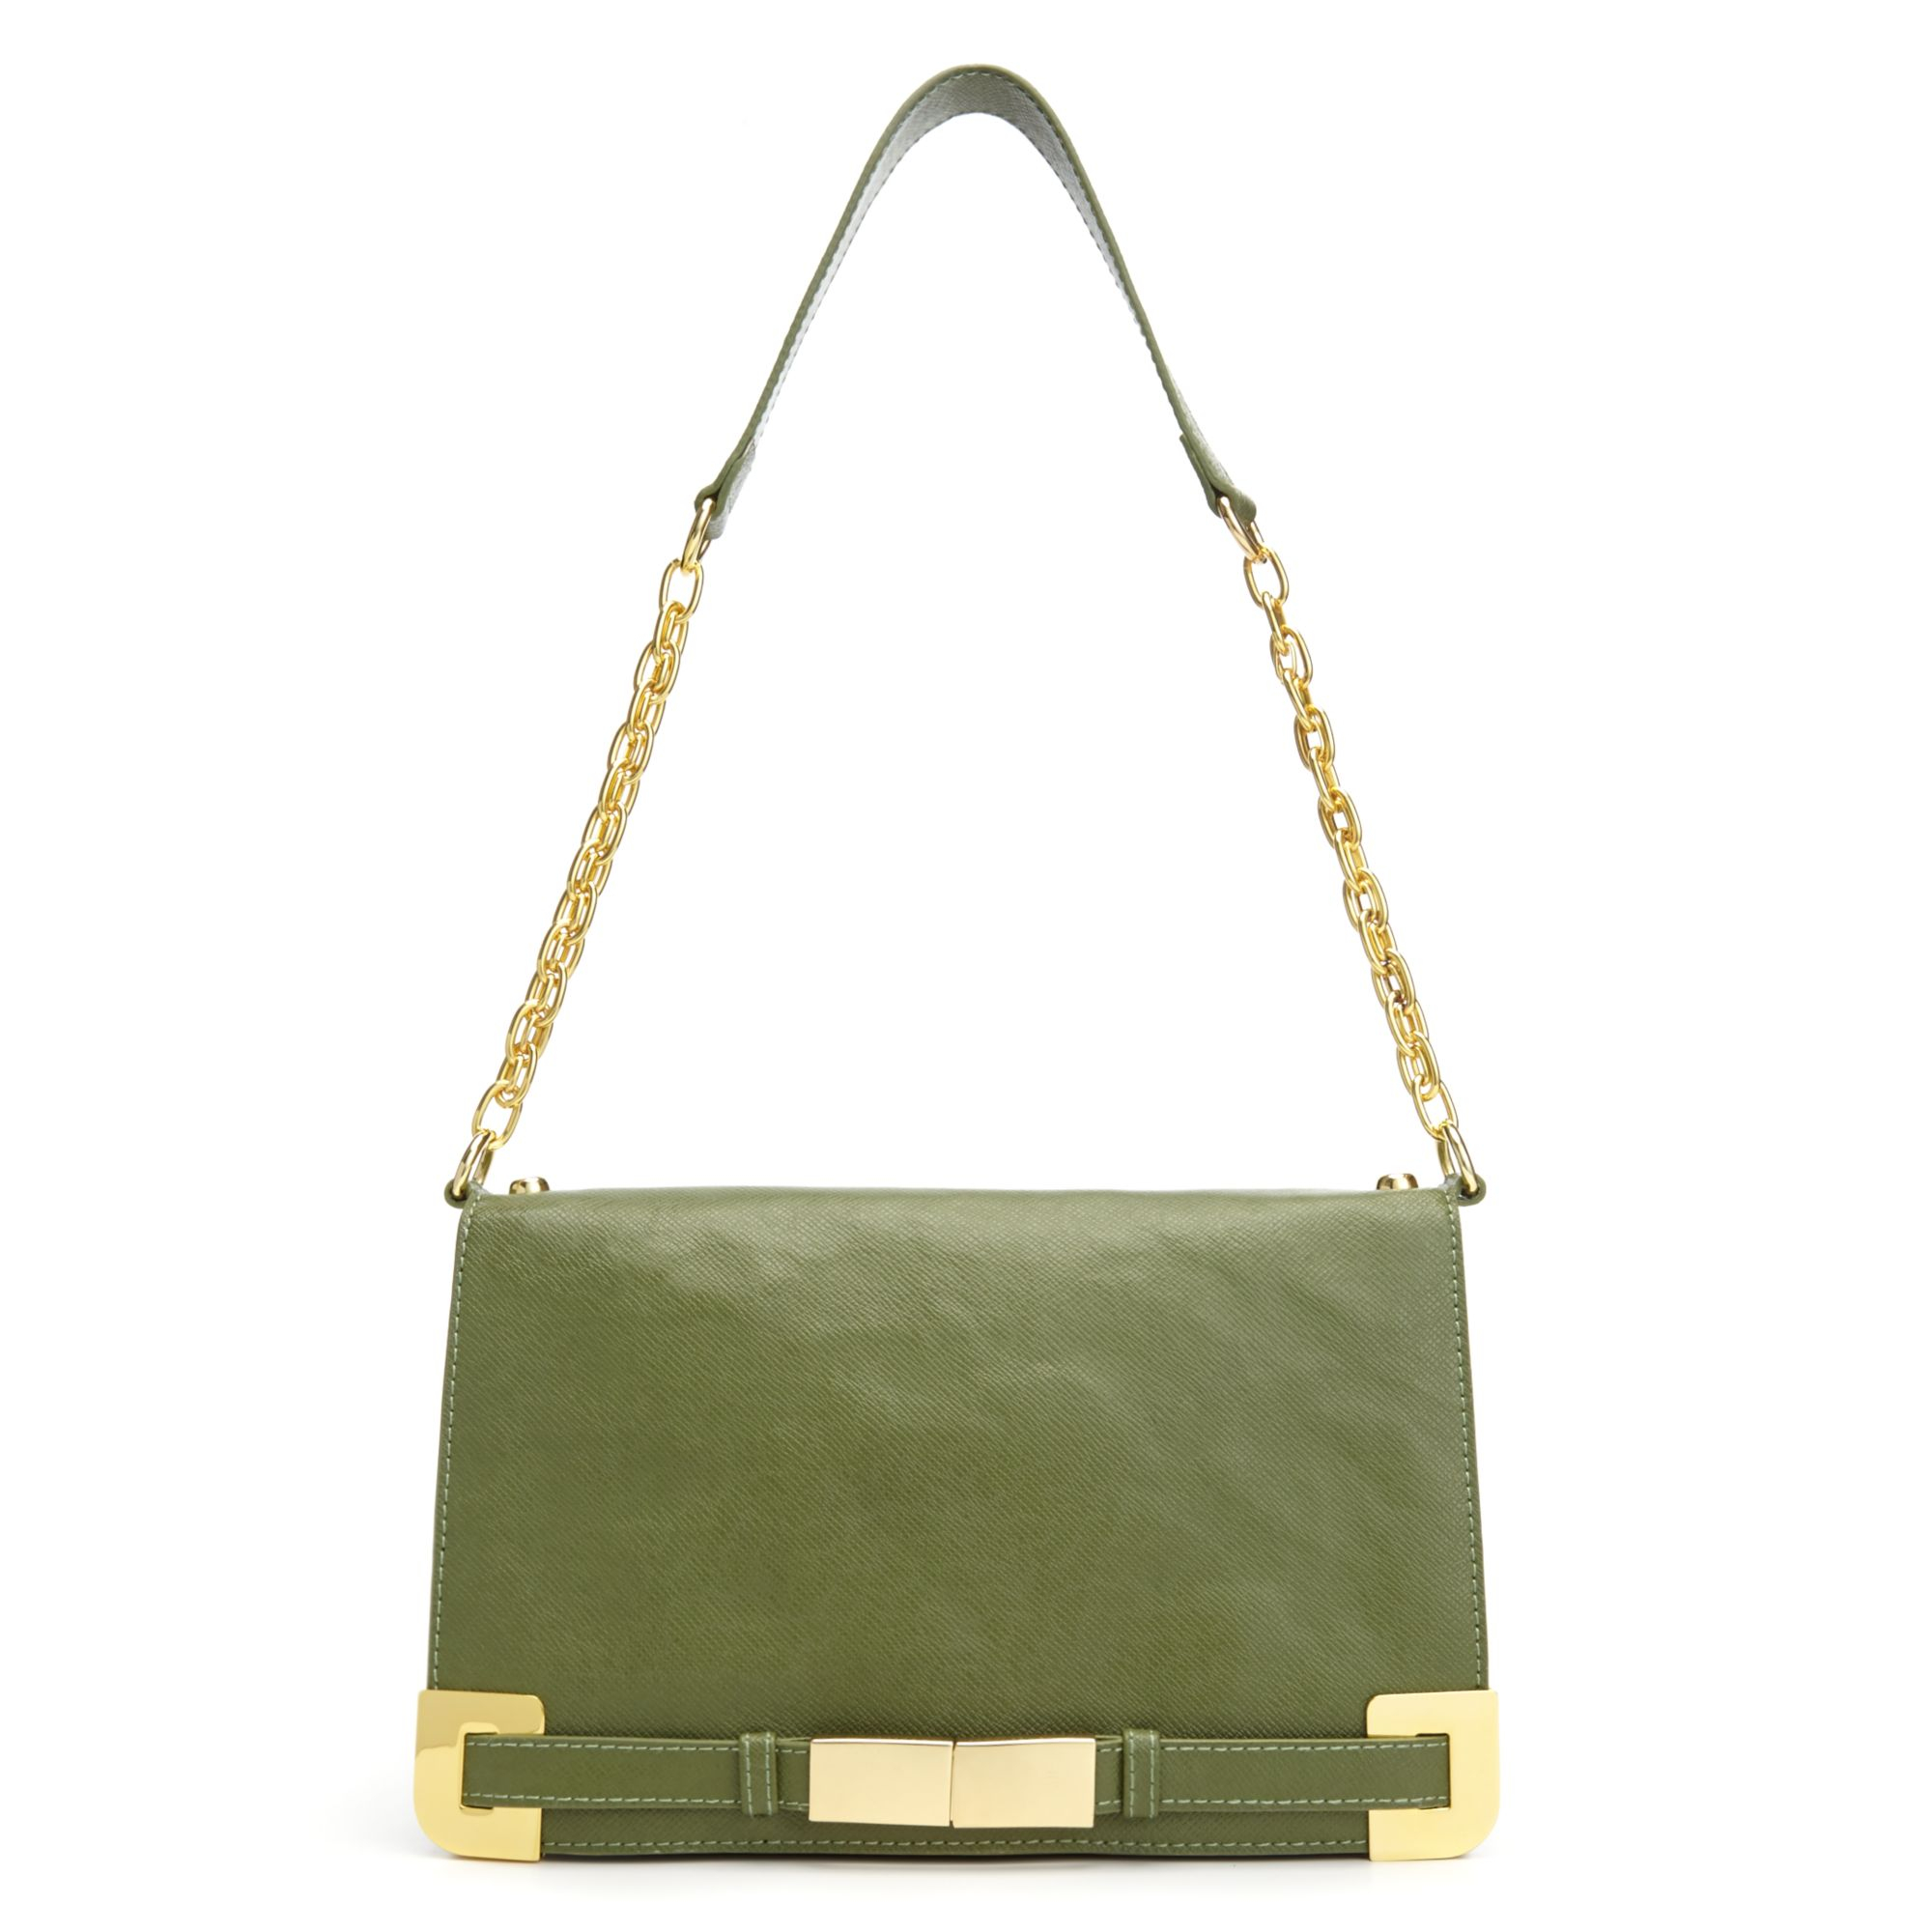 Ivanka Trump Onyx Shoulder Bag in Green (Olive) | Lyst